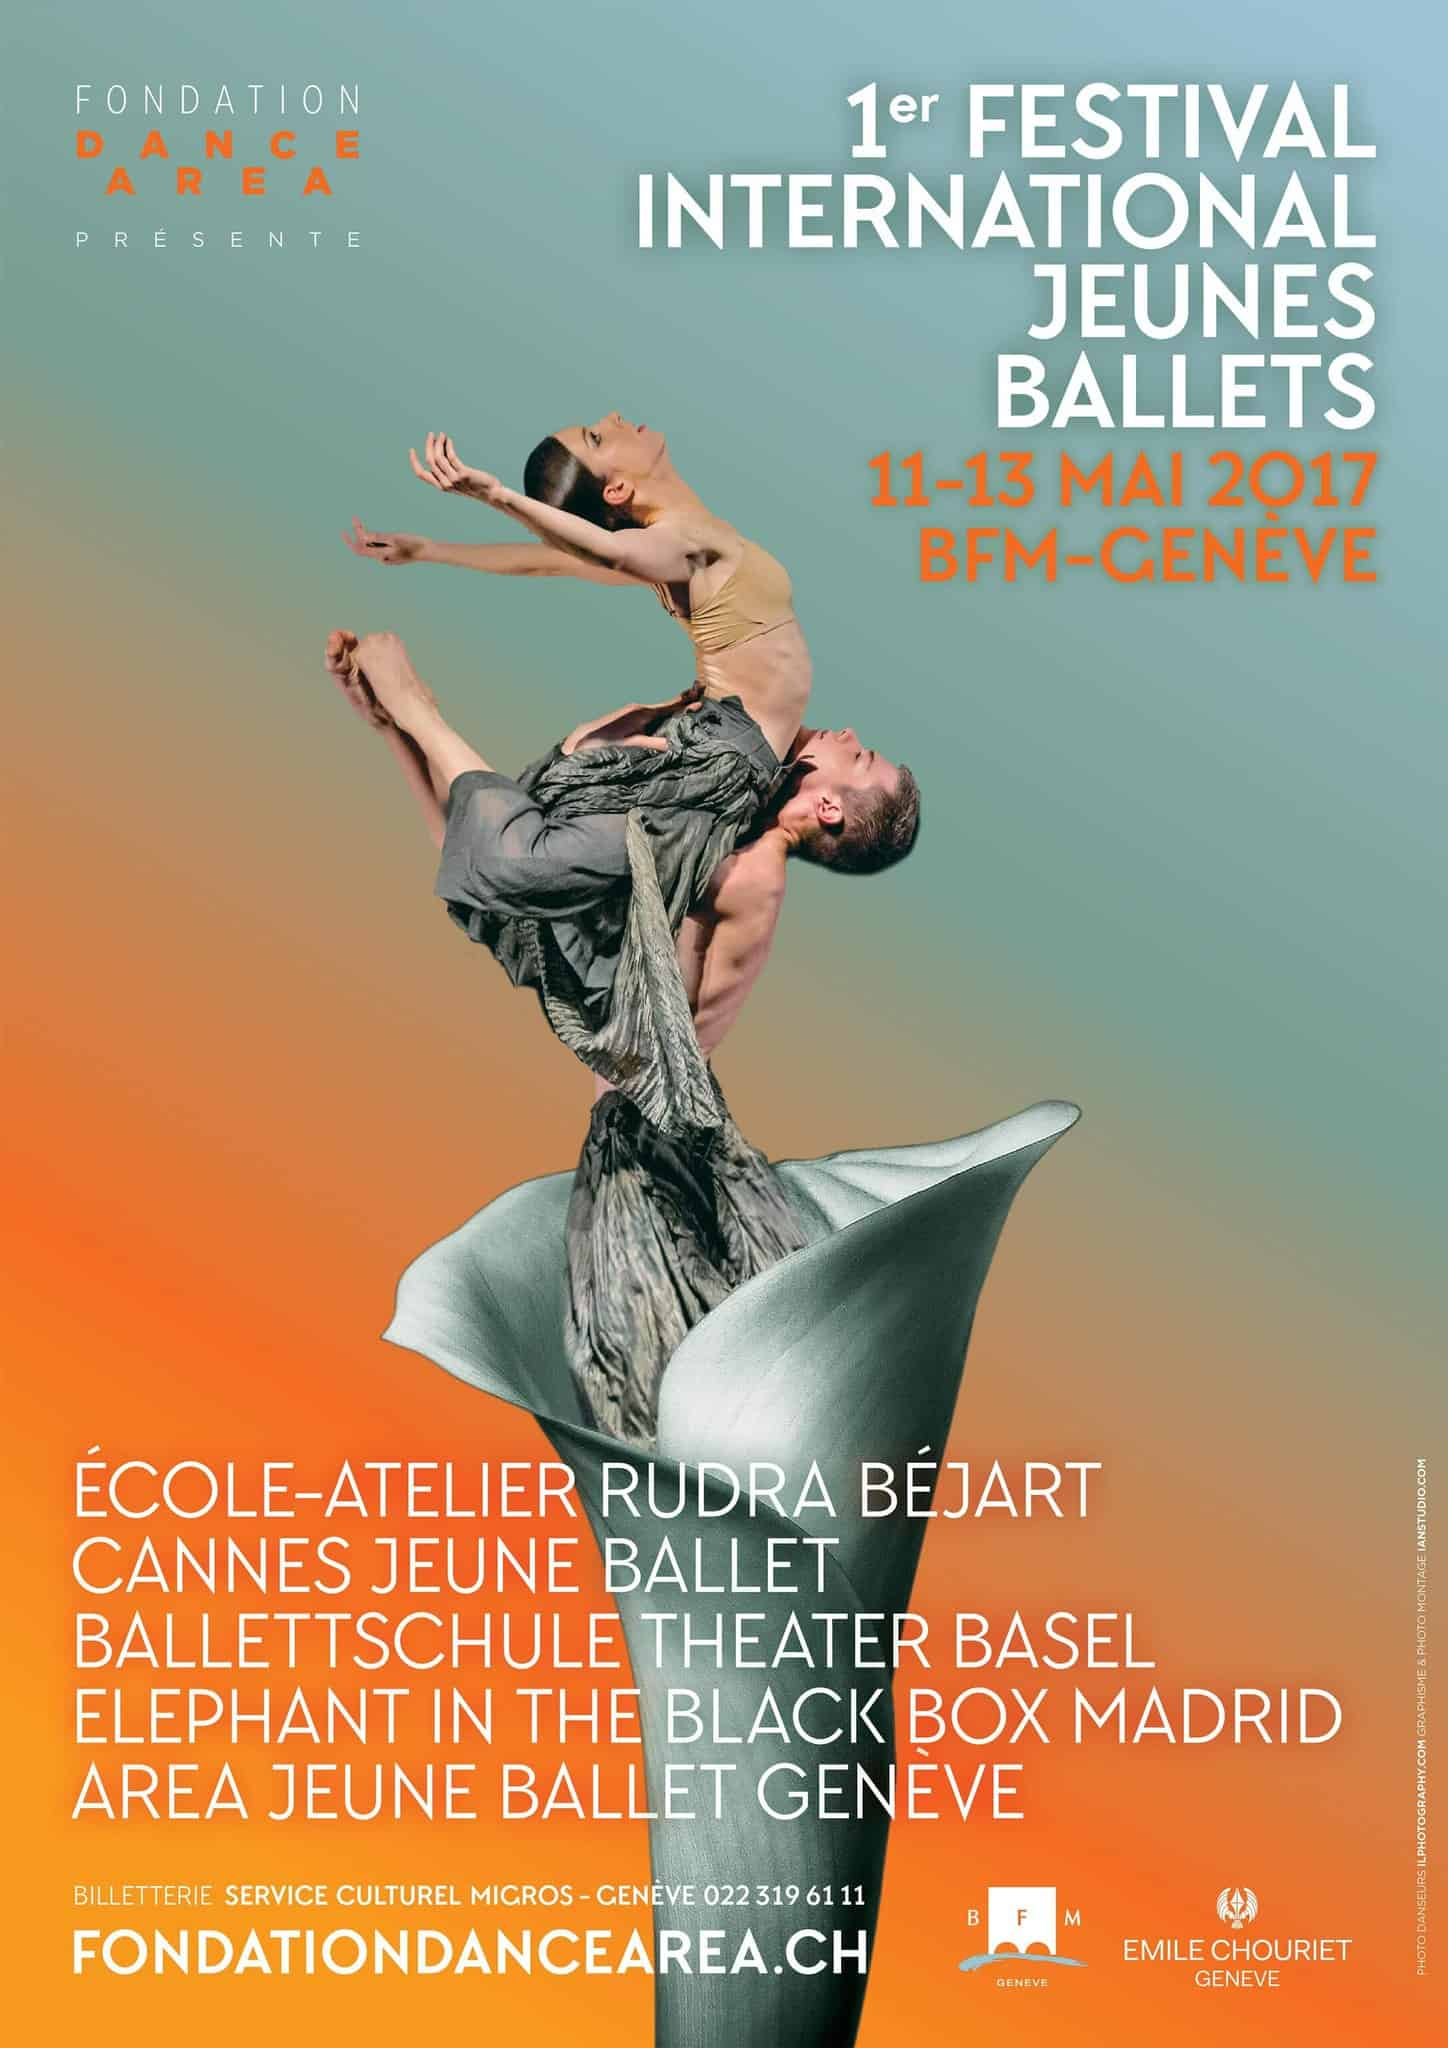 Festival International Jeunes Ballets